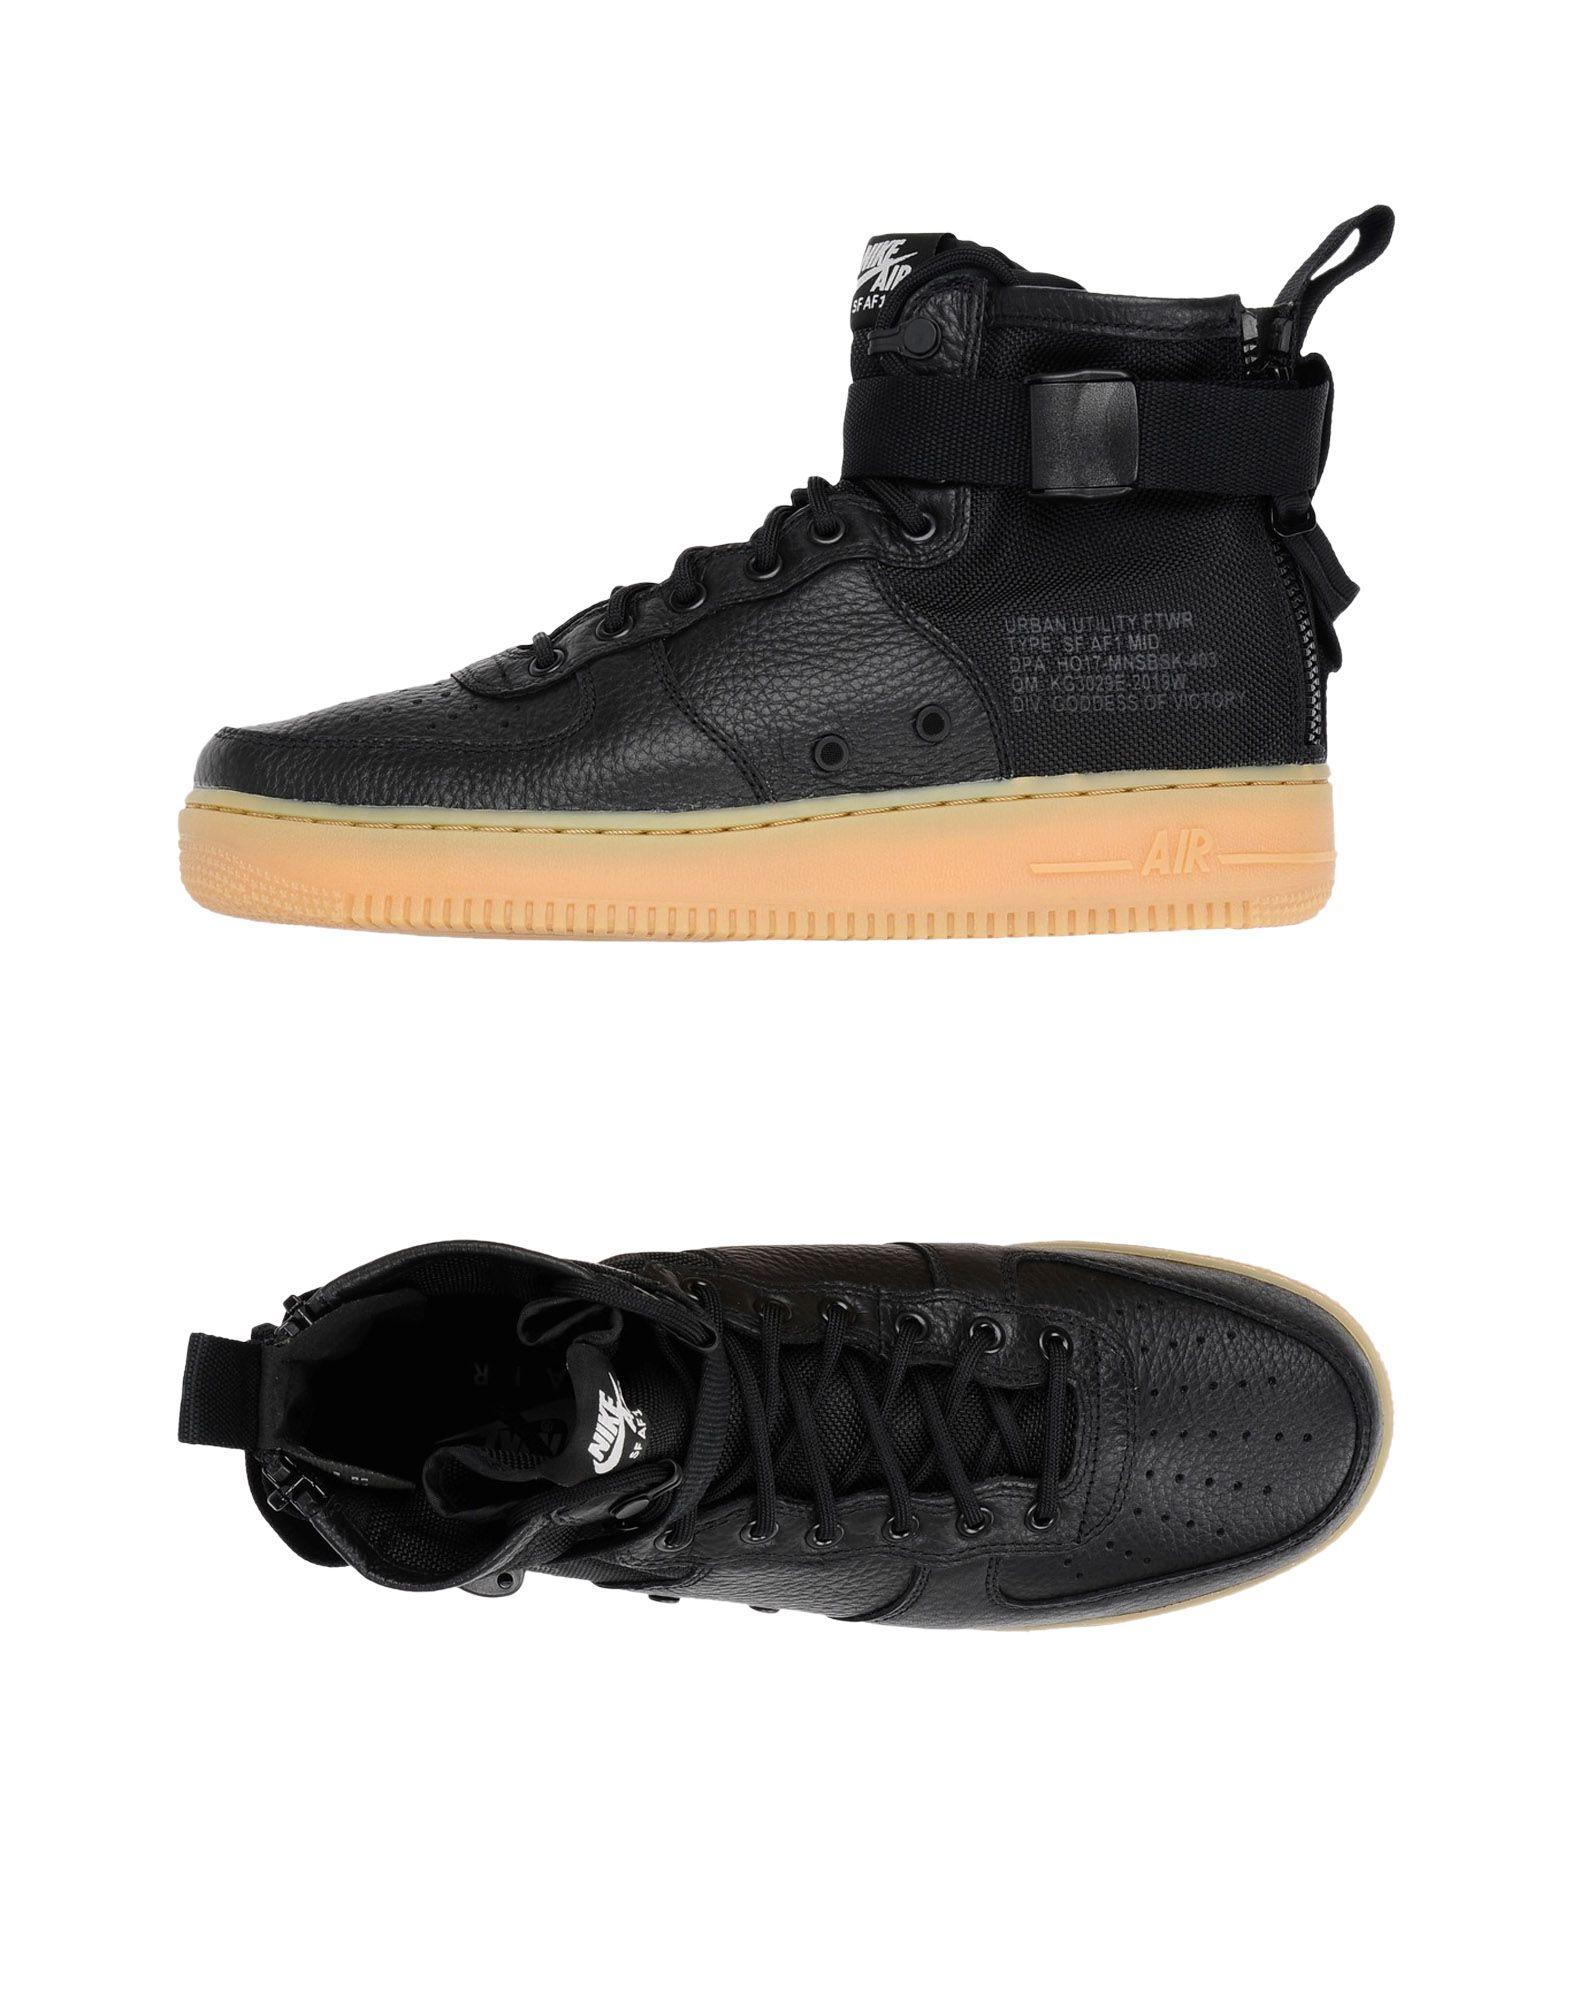 Sneakers Nike Sf Af1 11405917CB Mid - Uomo - 11405917CB Af1 ecd76b